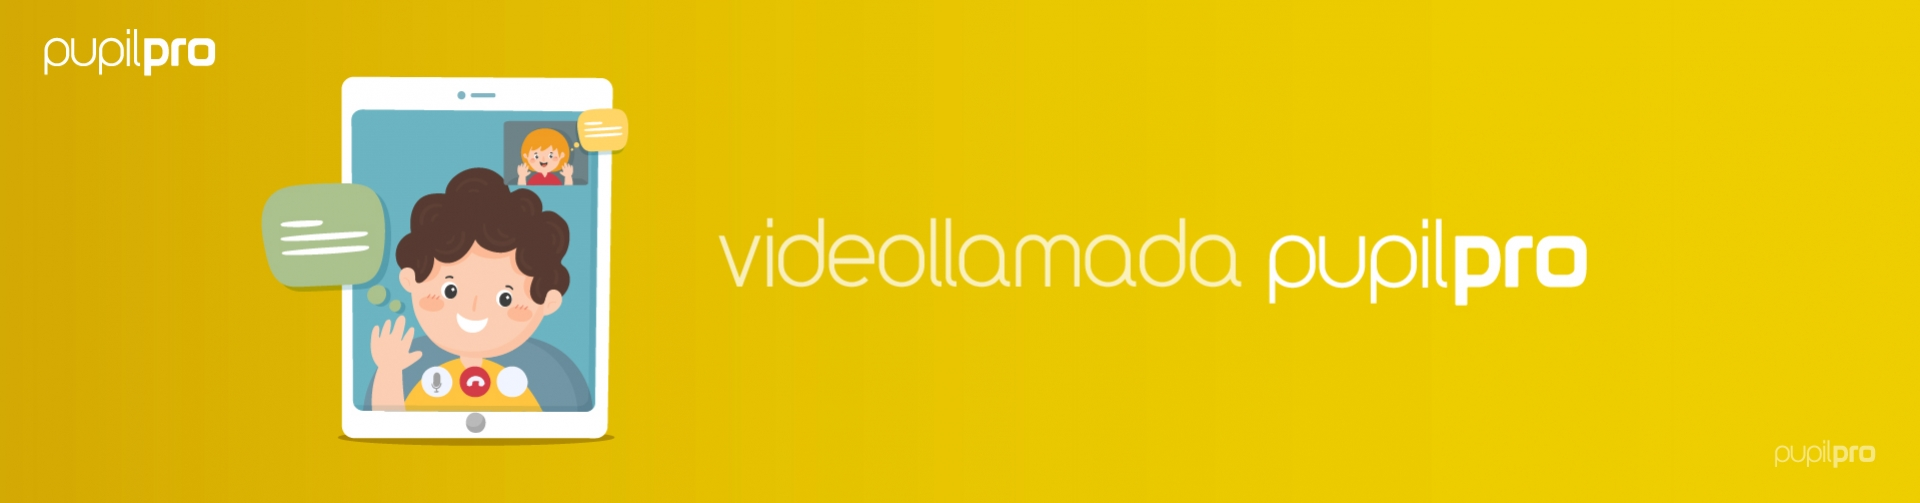 Videollamada en Pupilpro